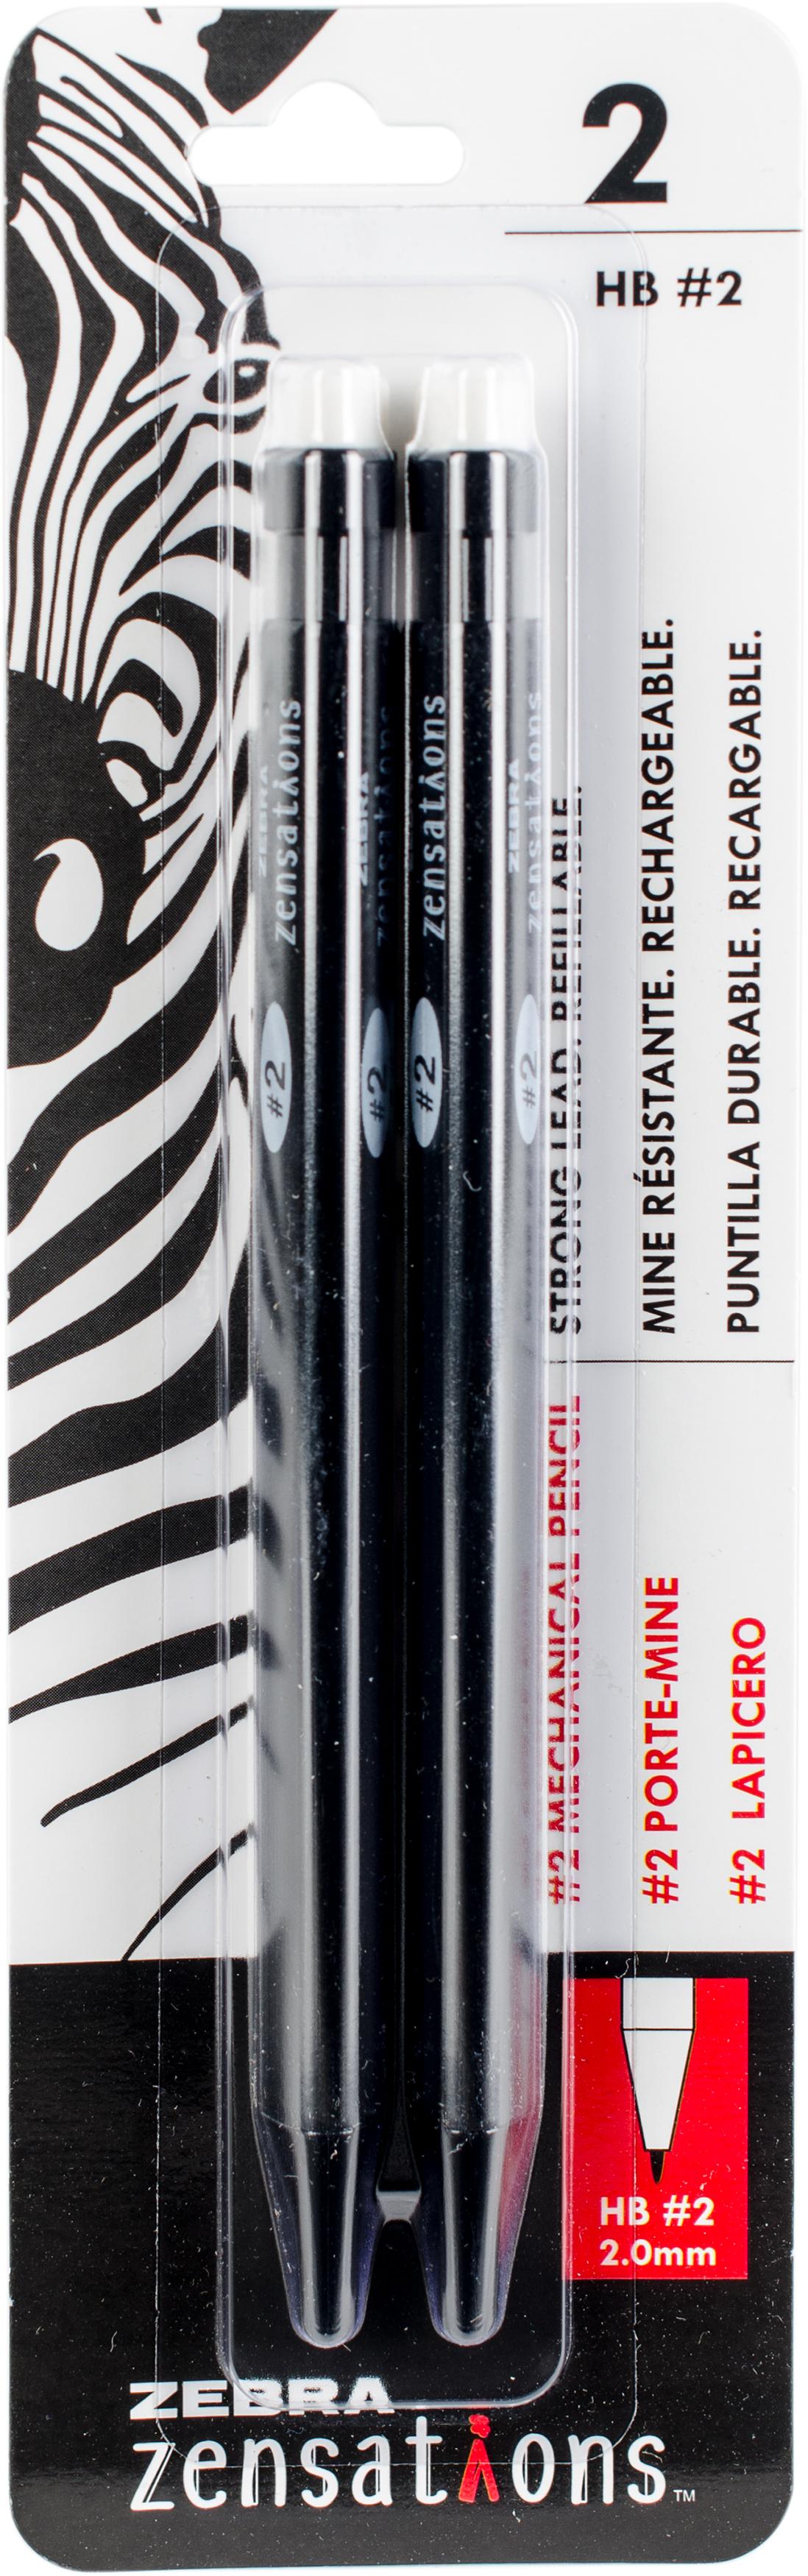 Zebra Zensations Mechanical #2 Pencils 2/Pkg-2.0mm